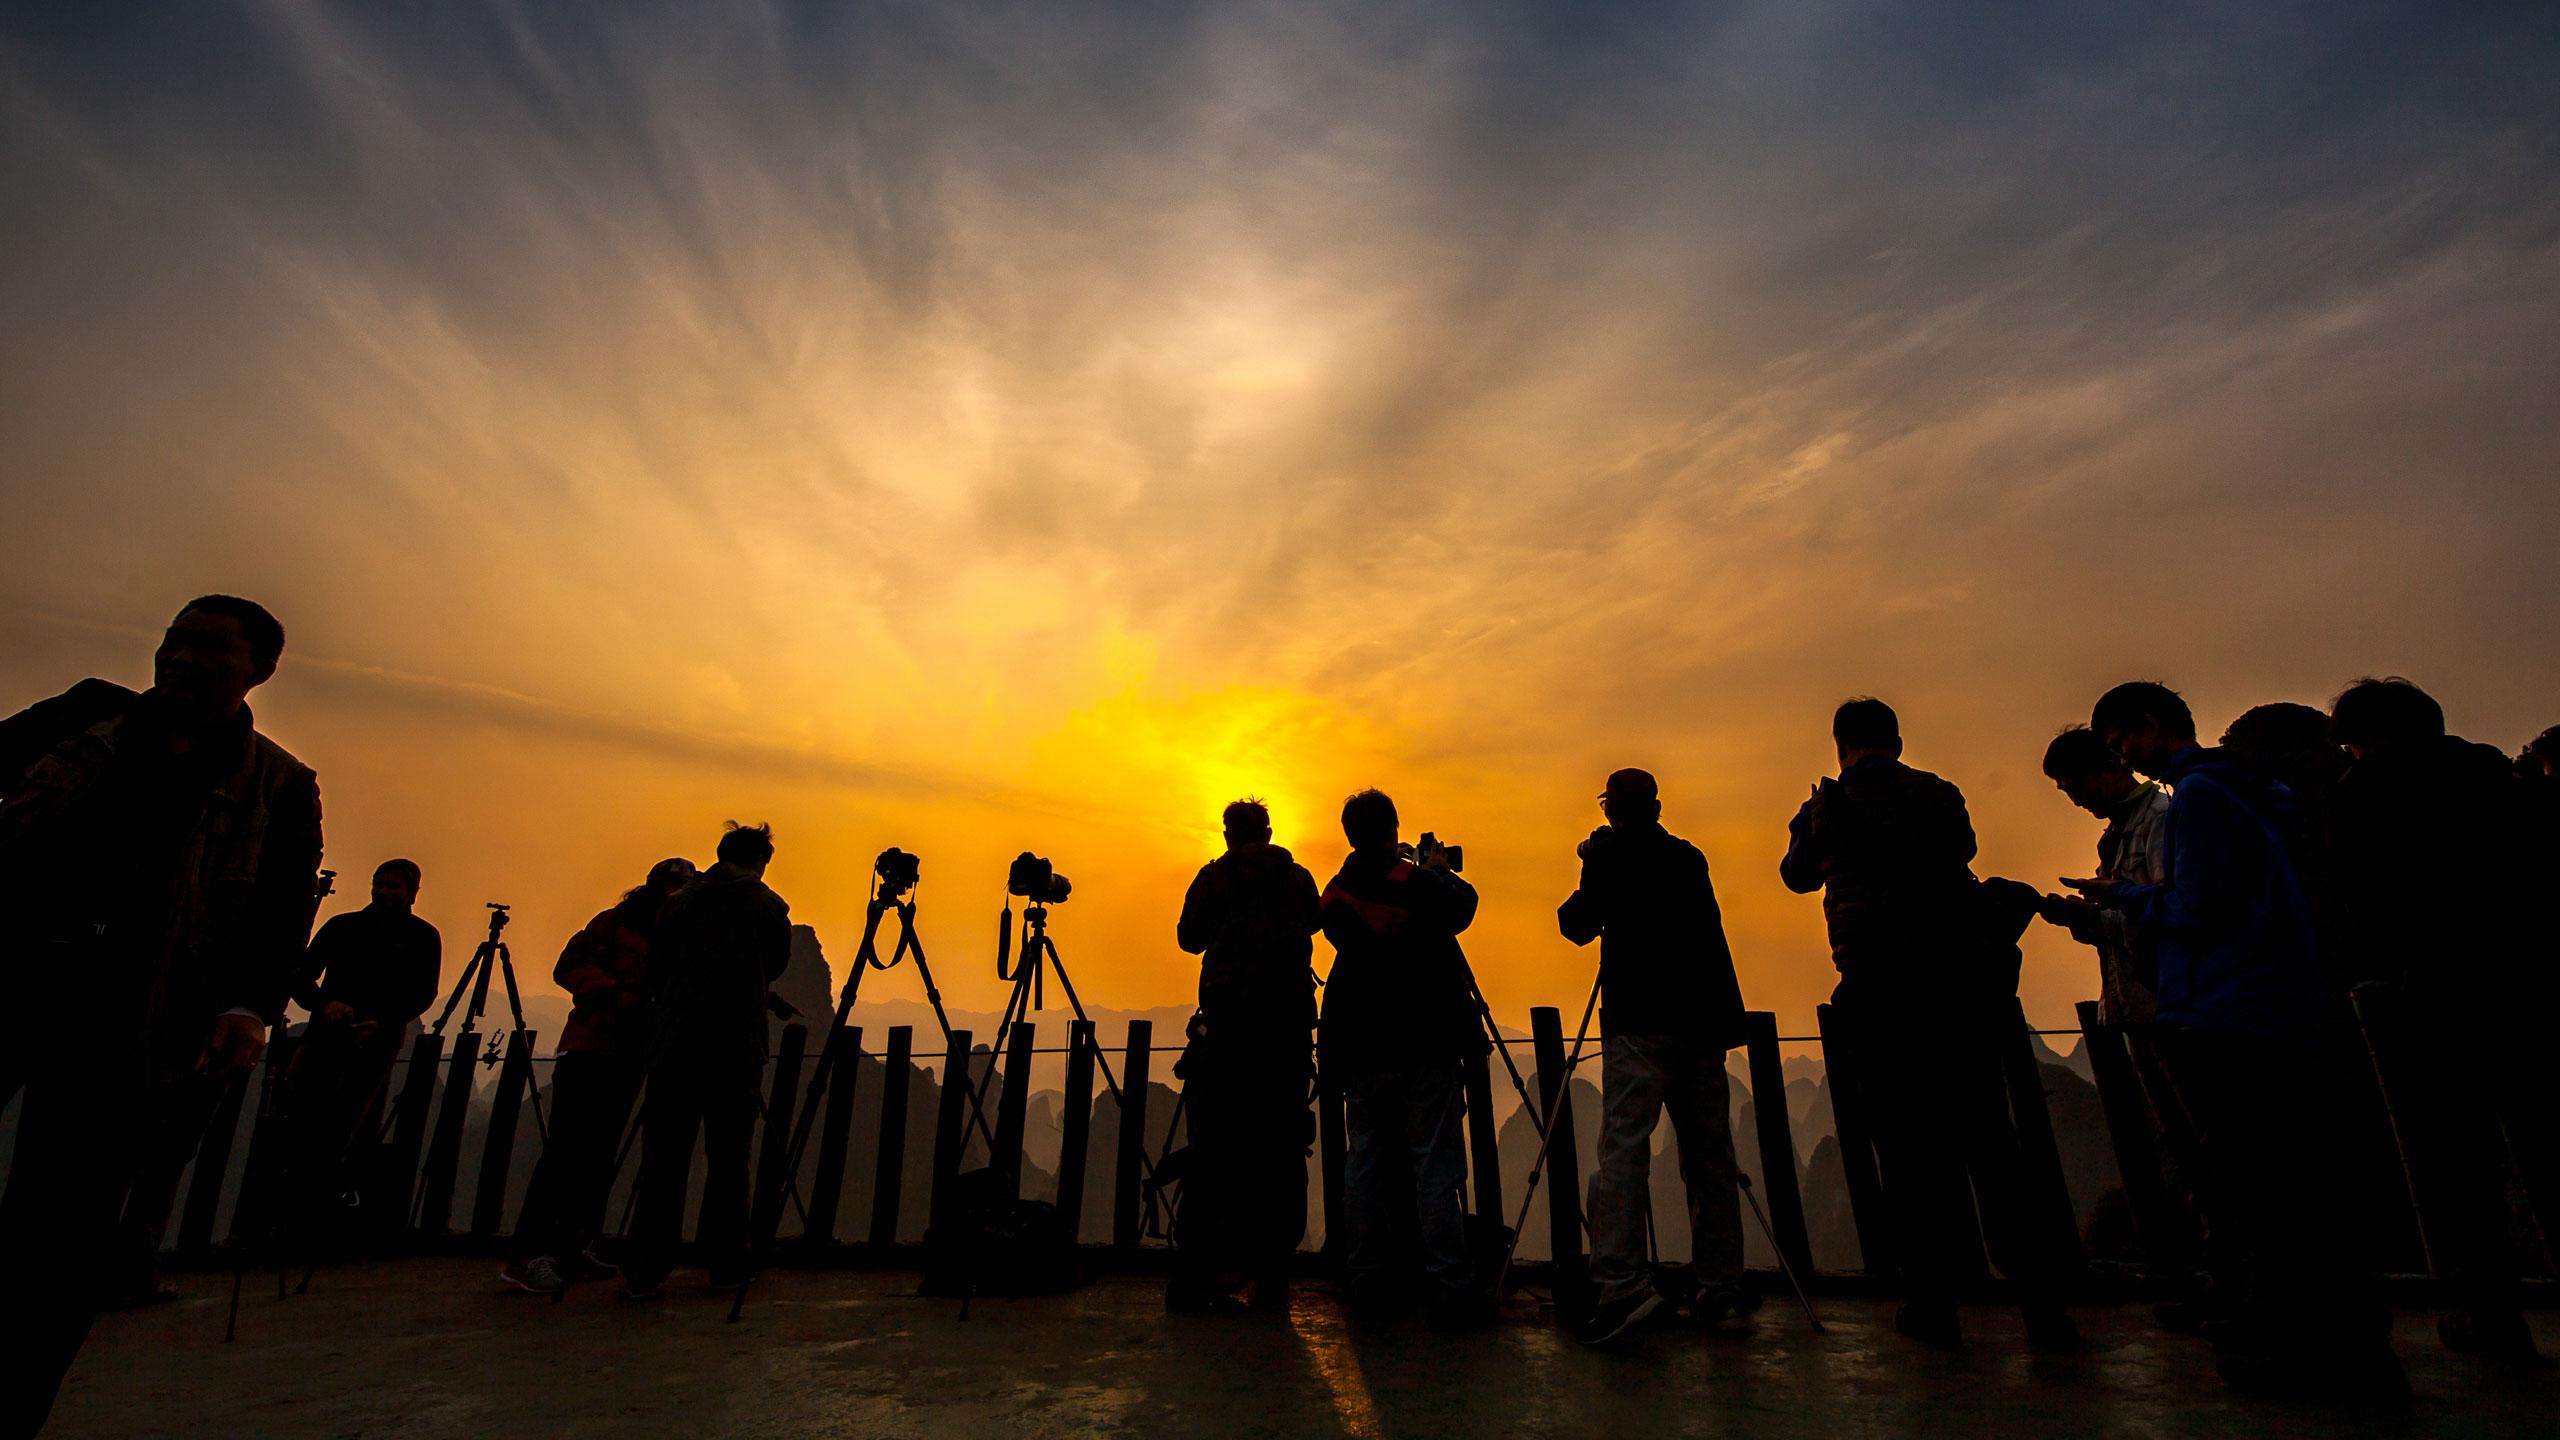 Photofocus Community